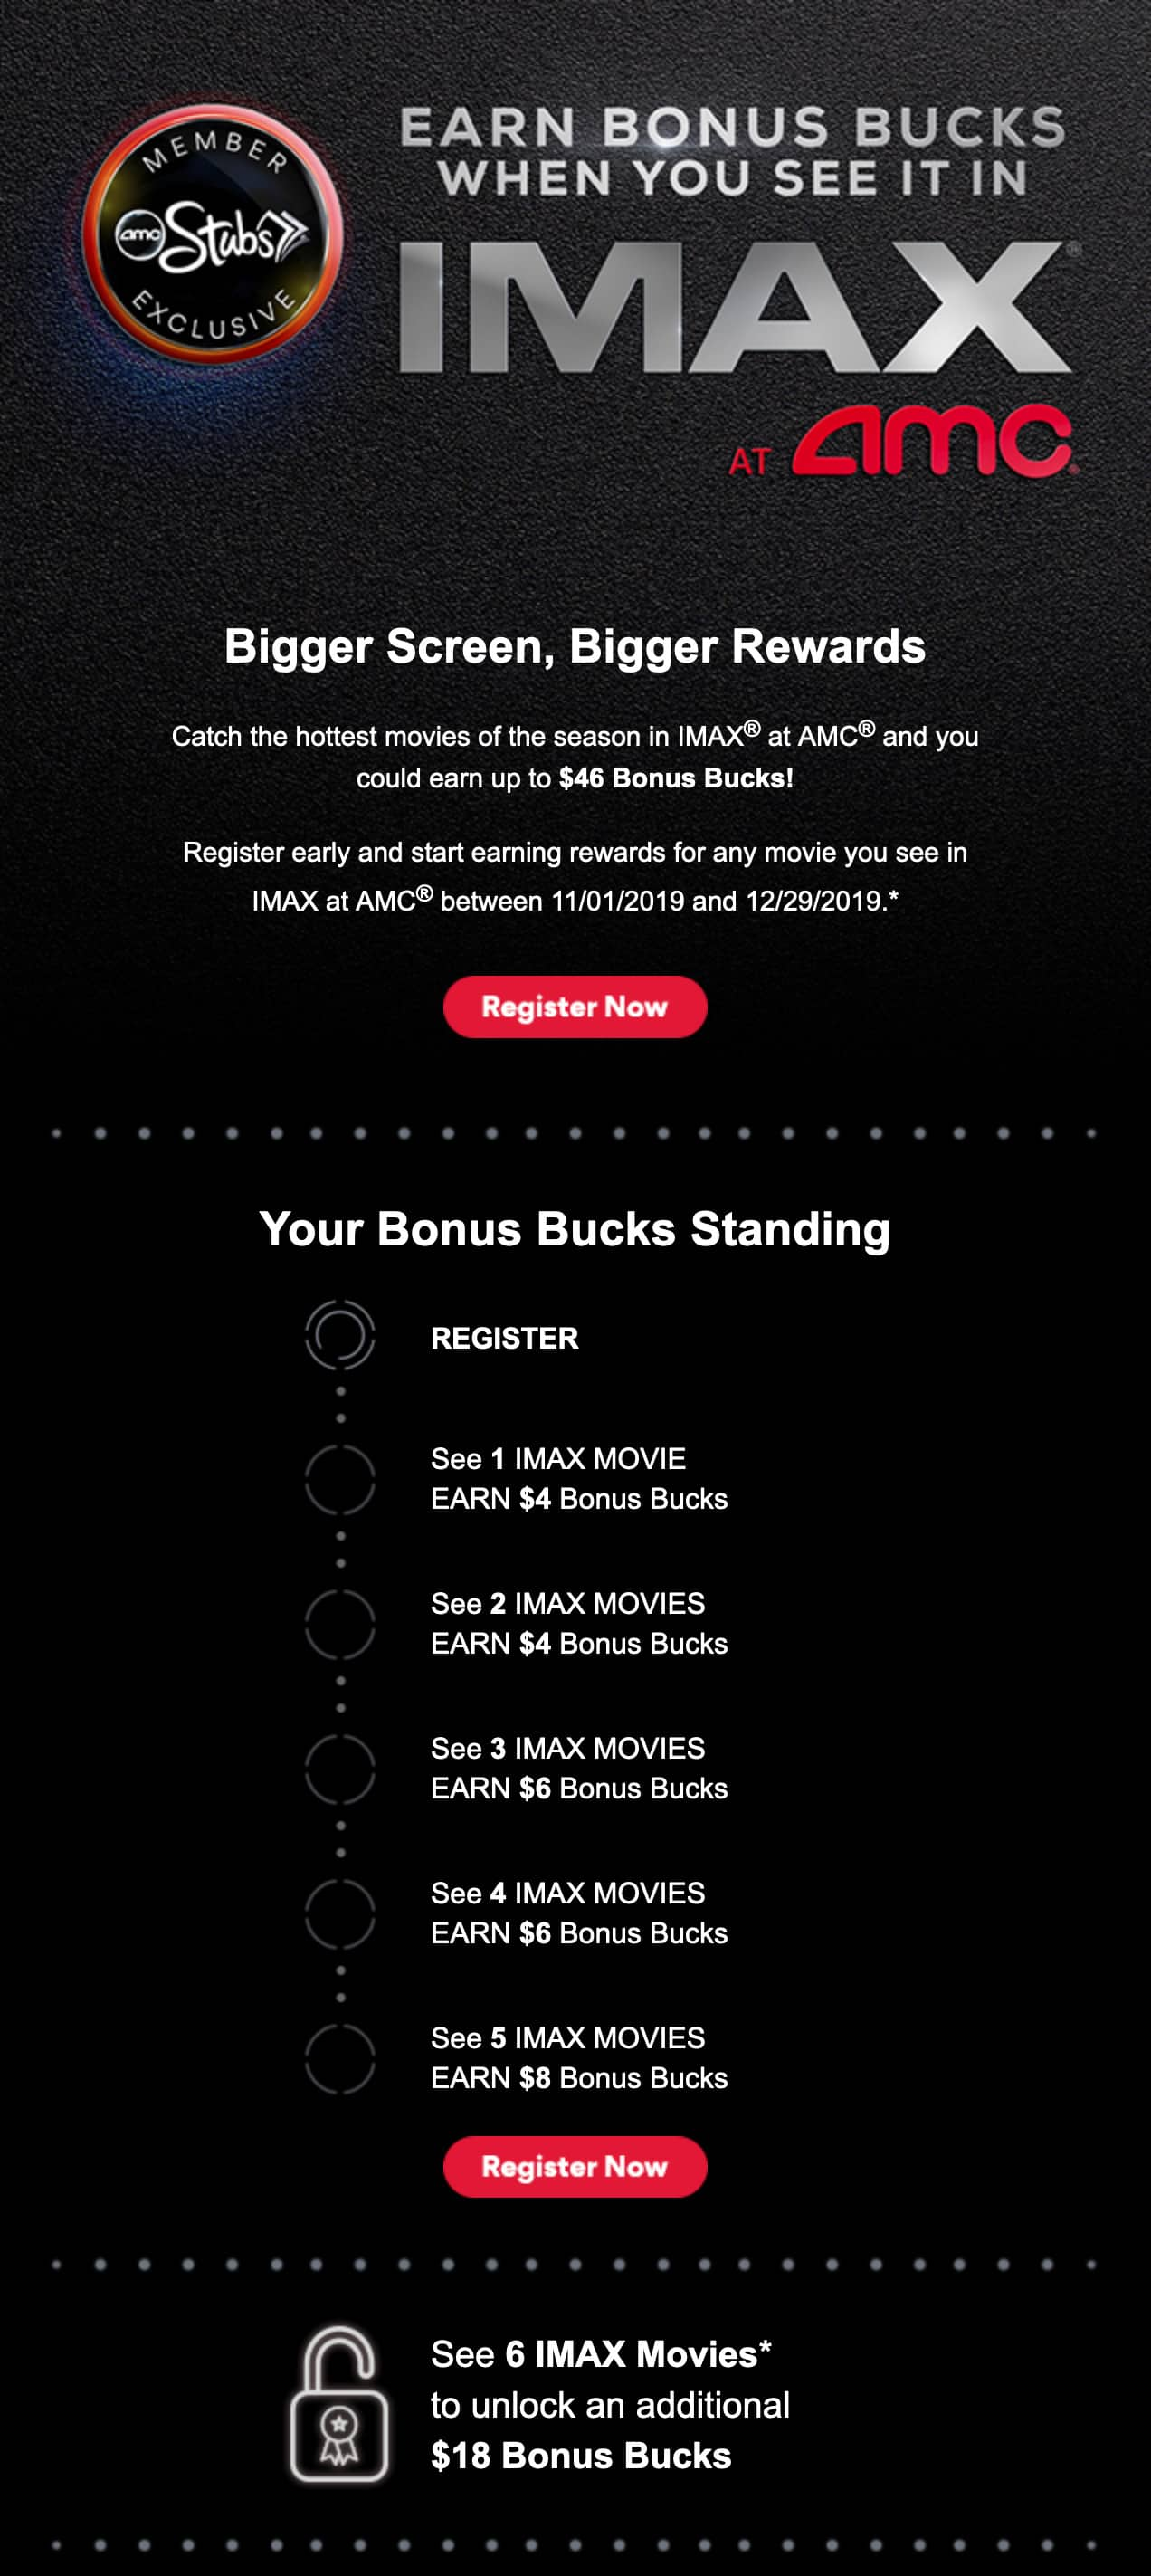 Earn up to $46 Bonus Bucks for seeing movies in IMAX @ AMC between 11/1/19 - 12/29/19